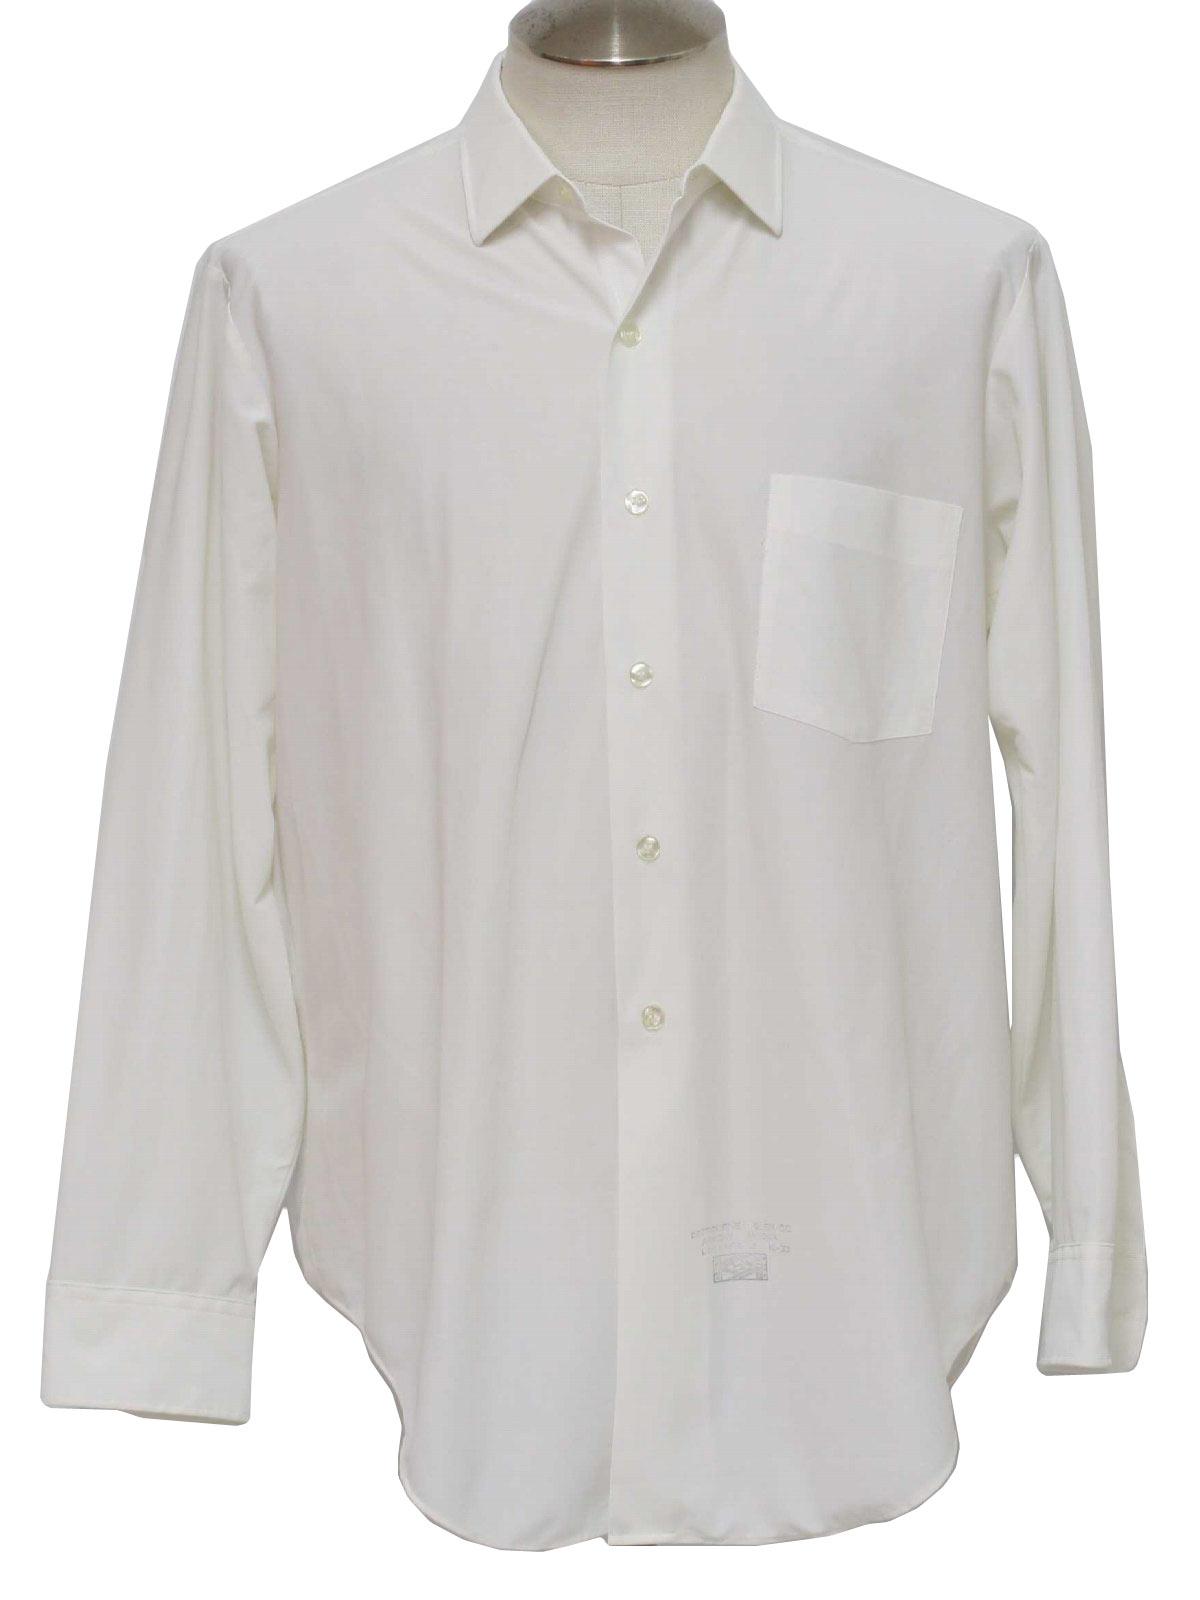 Mens White Collar Shirt